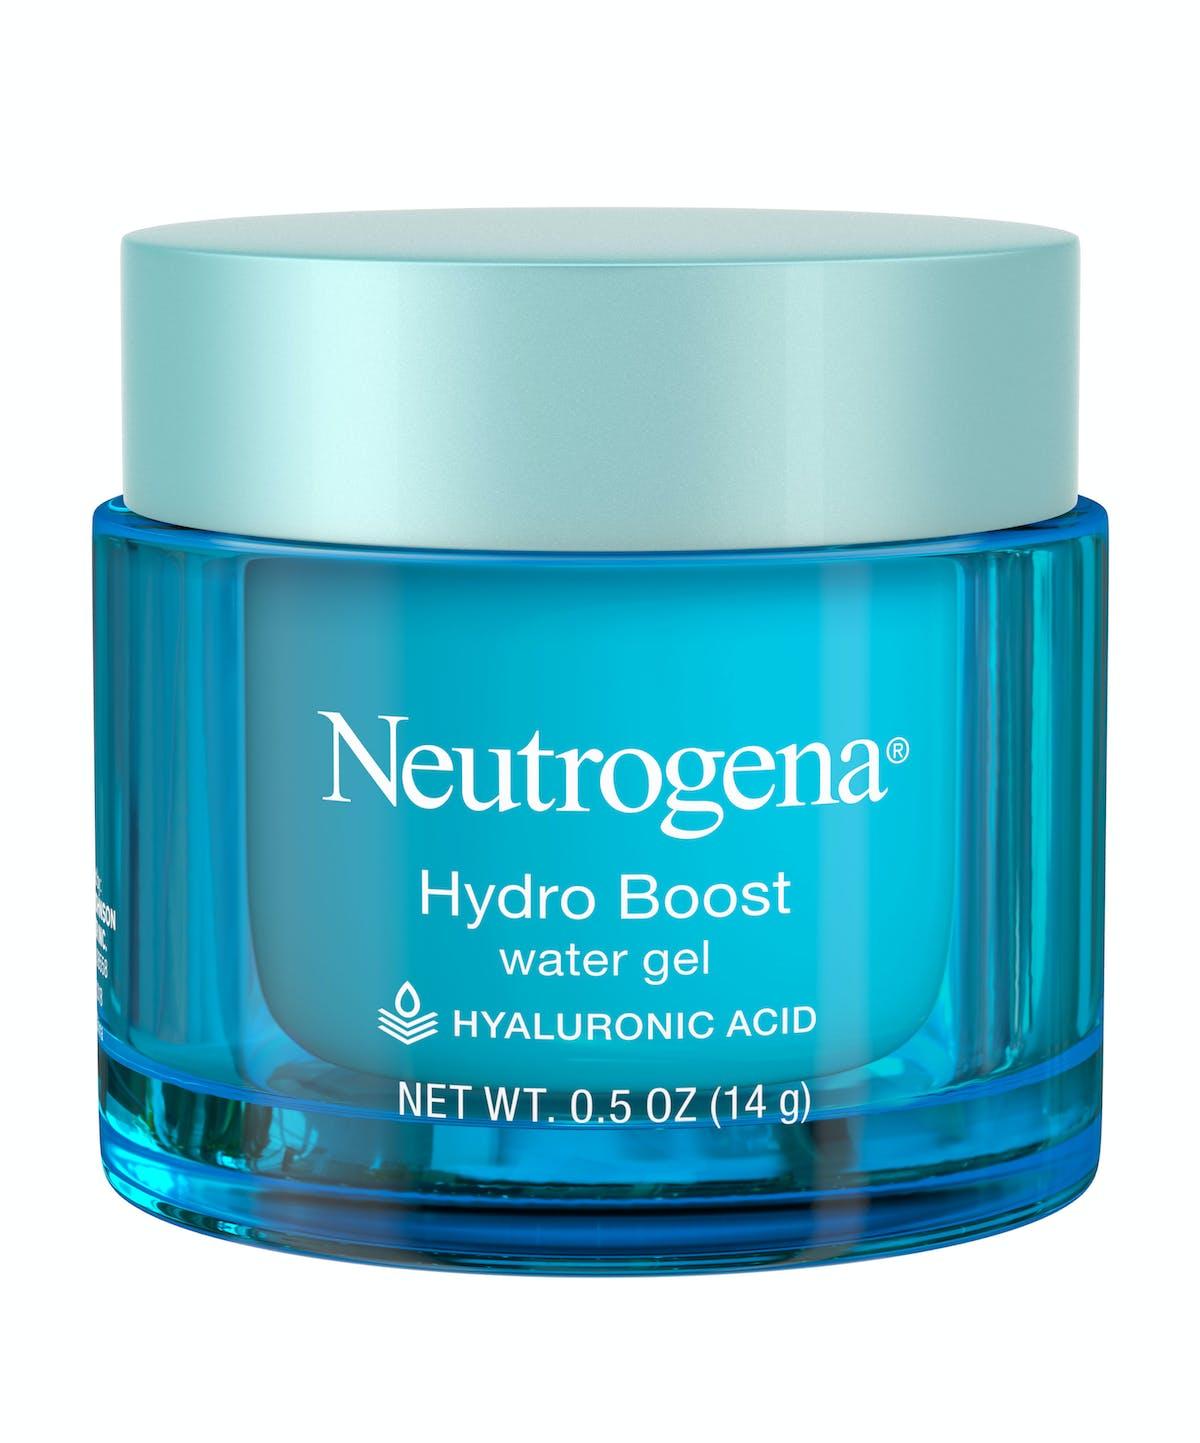 nouveau produit 6b403 1e916 Neutrogena® Hydro Boost Water Gel with Hyaluronic Acid for Dry Skin